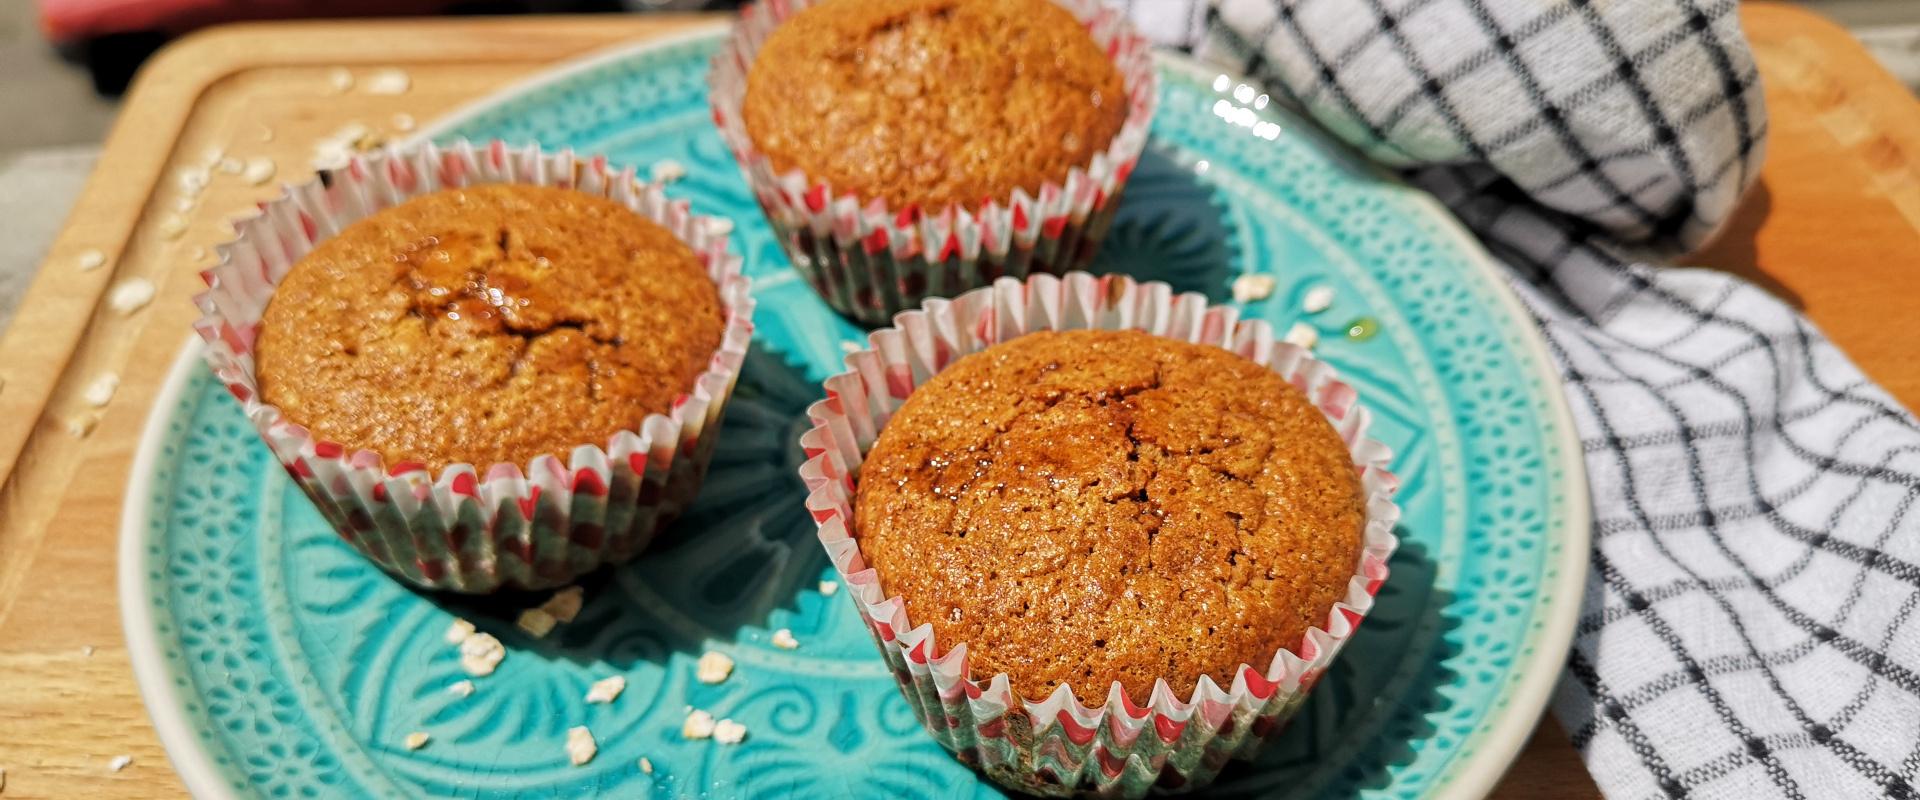 mézes zablisztes muffin cover